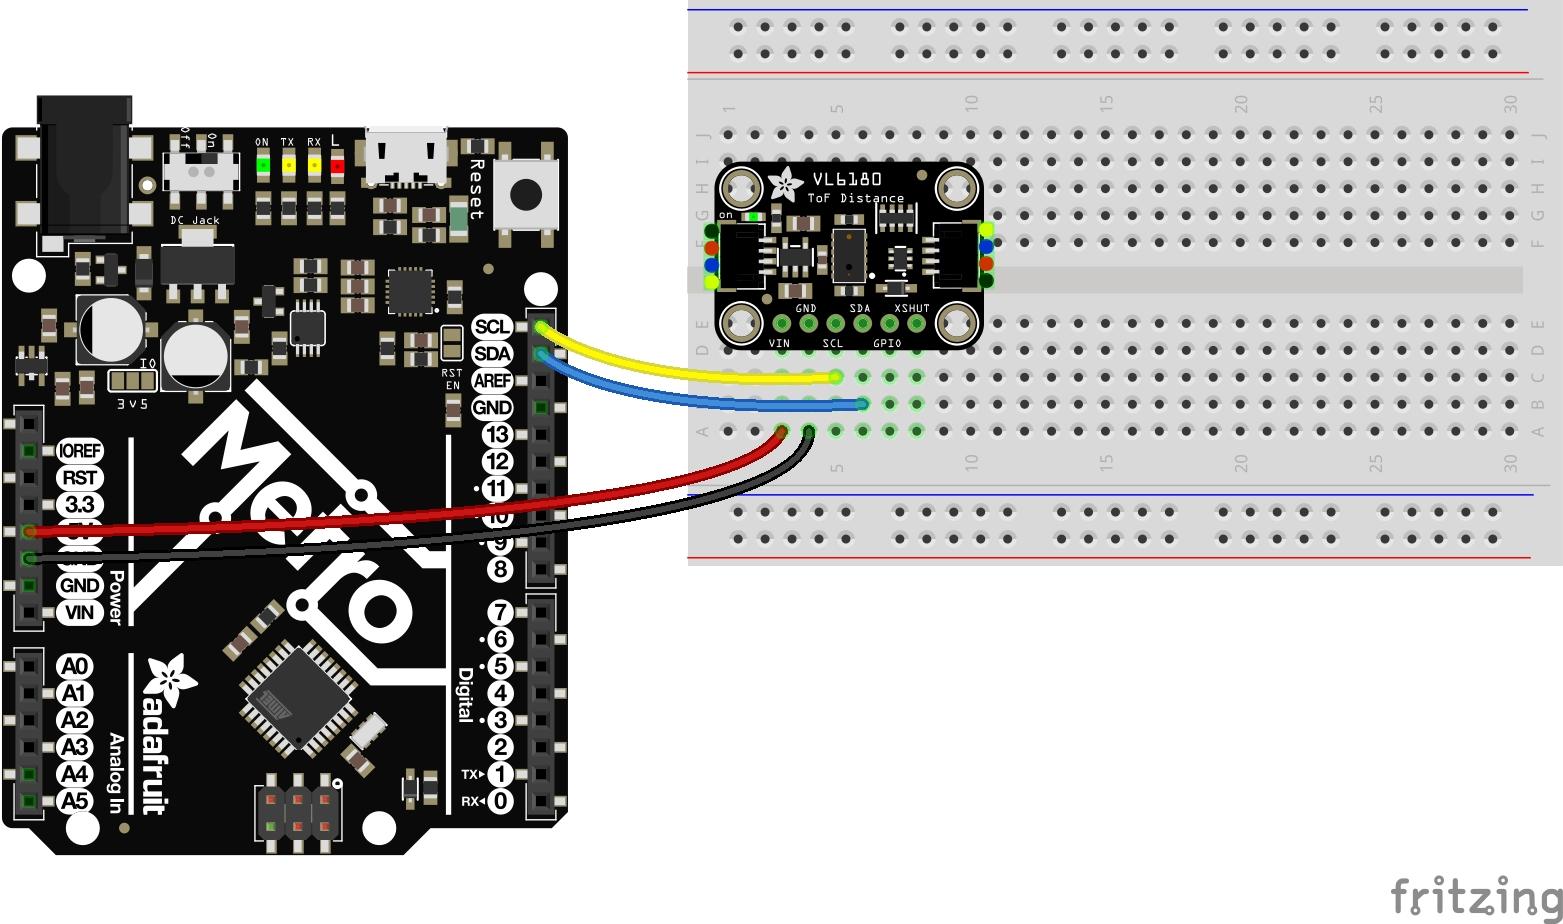 proximity_VL6180_arduino_breadboard_bb.jpg